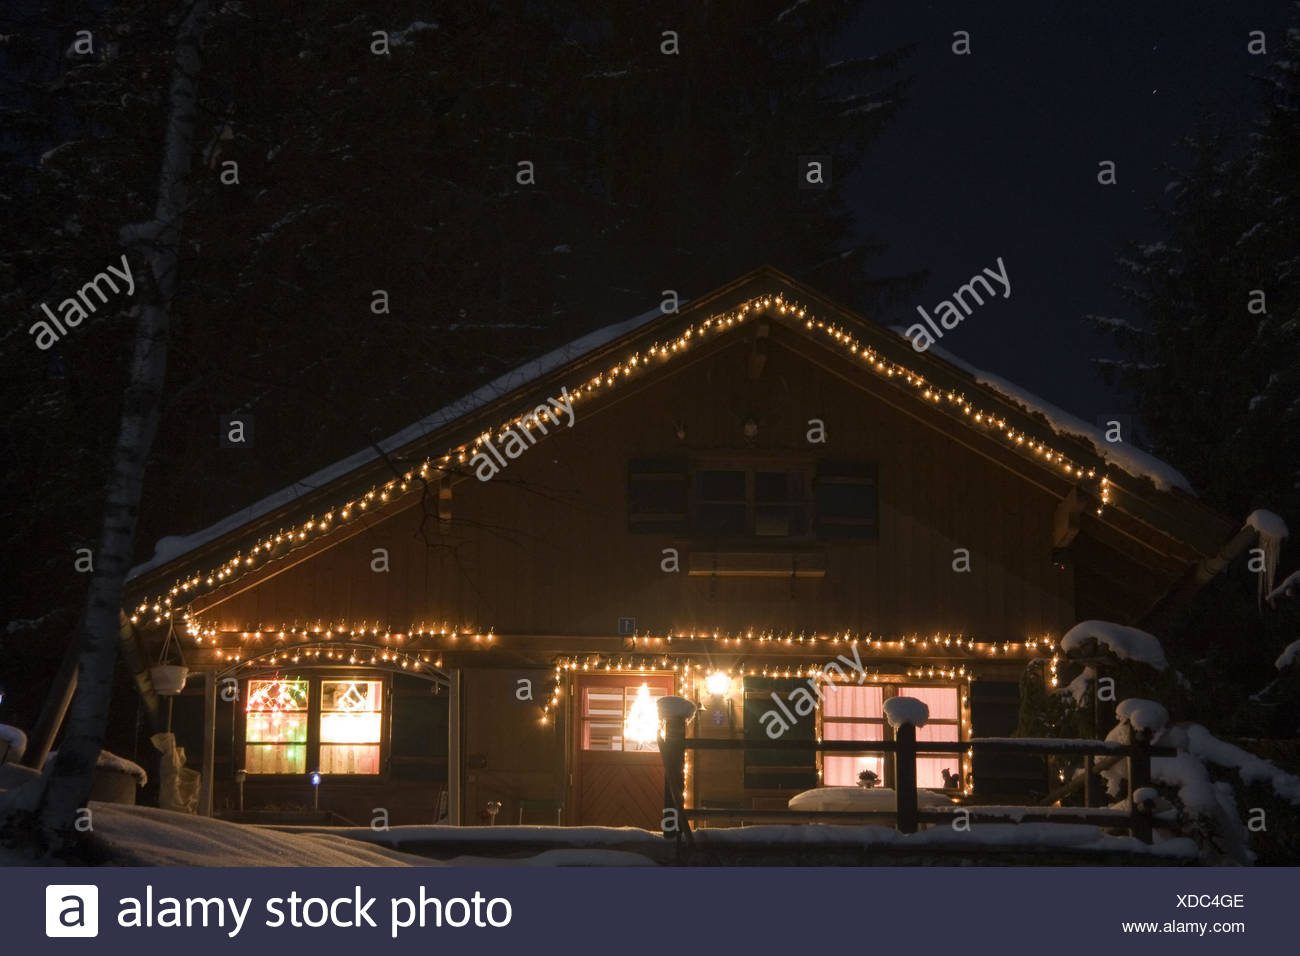 Acciaieria illuminato per natale candela illuminato raduni